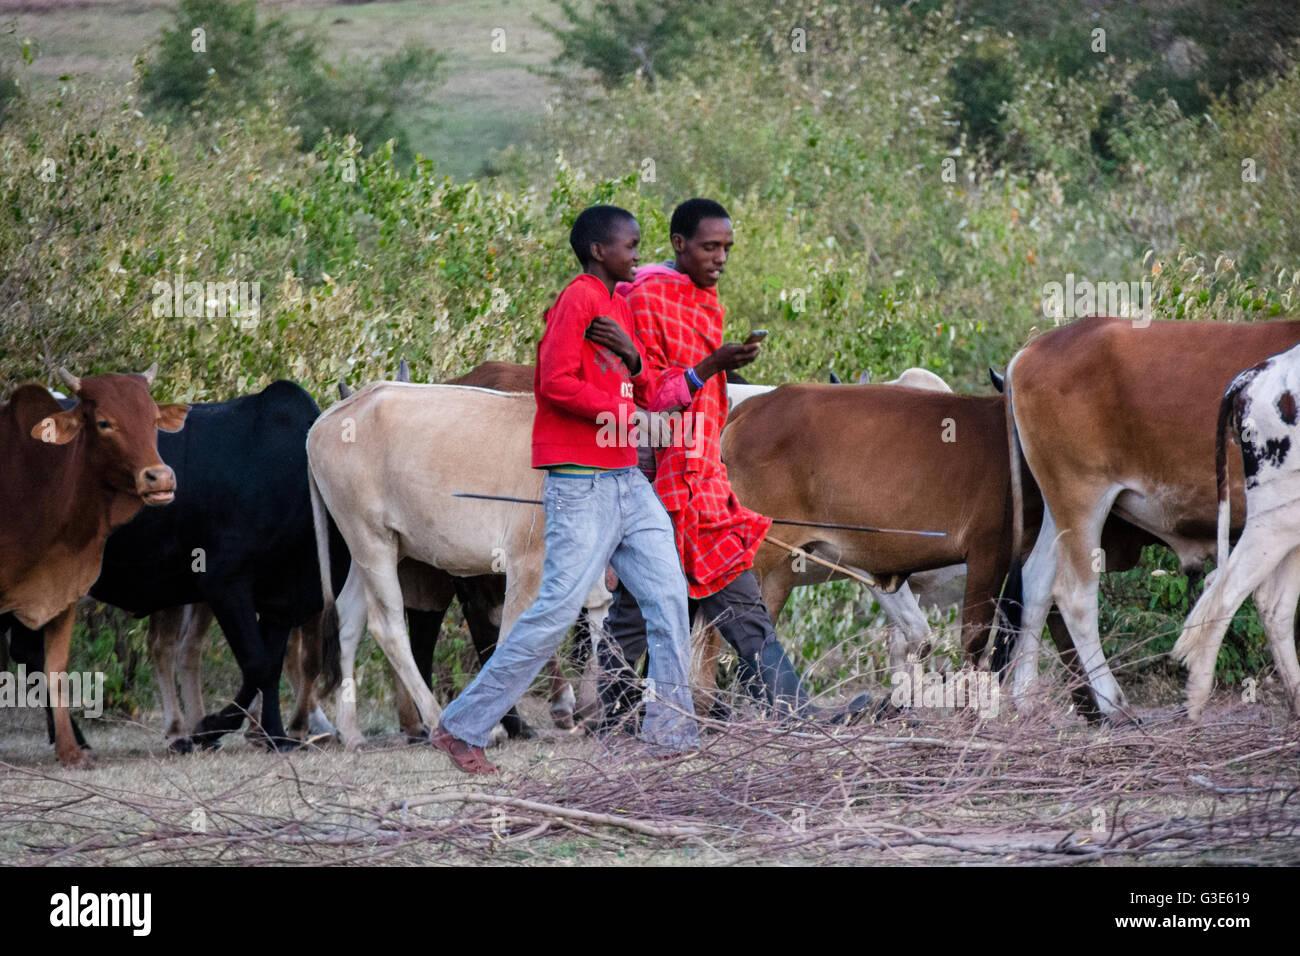 Masai man checks his cell phone while herding cattle in a village near the Masai Mara, Kenya, East Africa - Stock Image